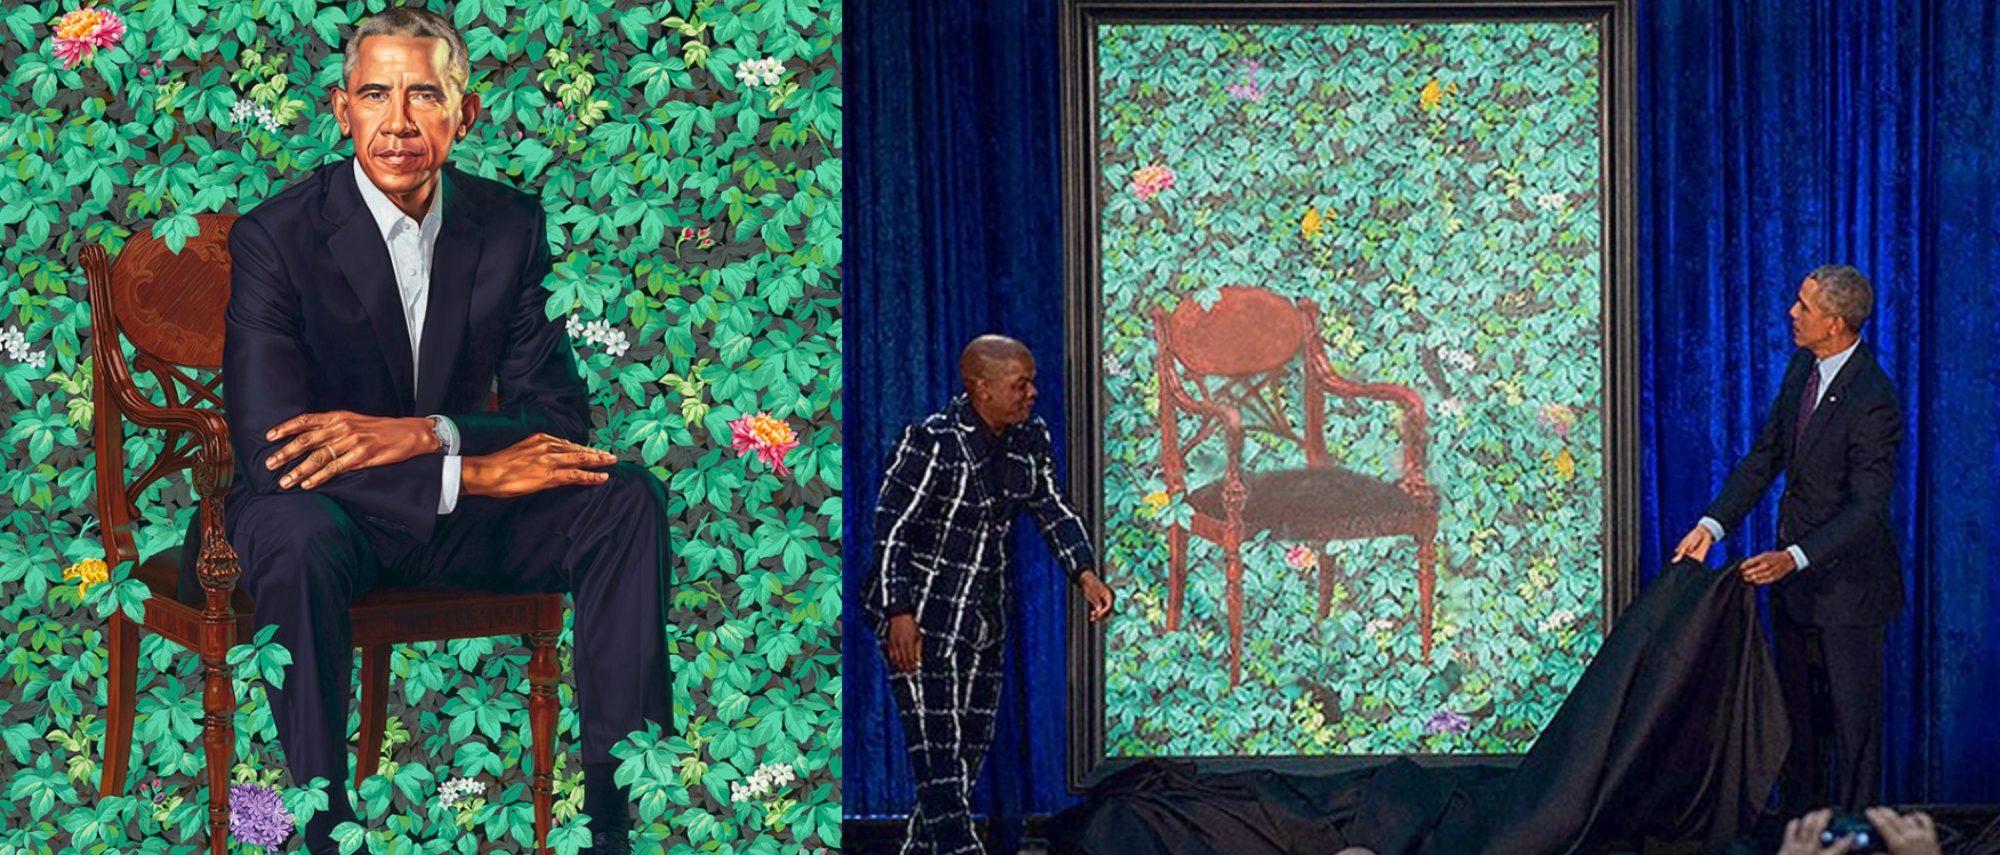 Obama Portrait Satire (Courtesy of David Combs)